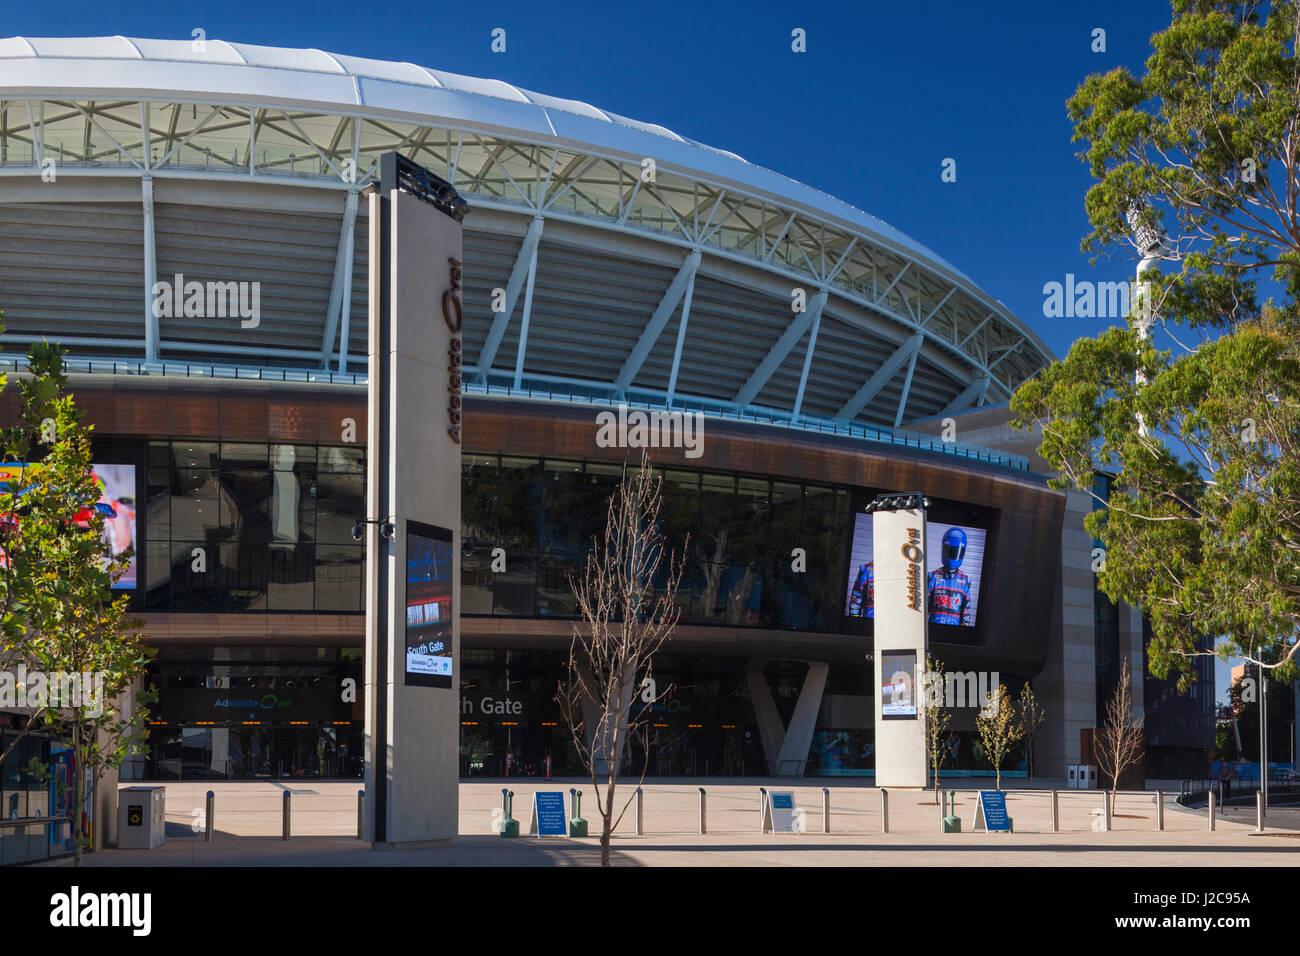 Australia, Adelaide, Adelaide Oval, sports arena - Stock Image